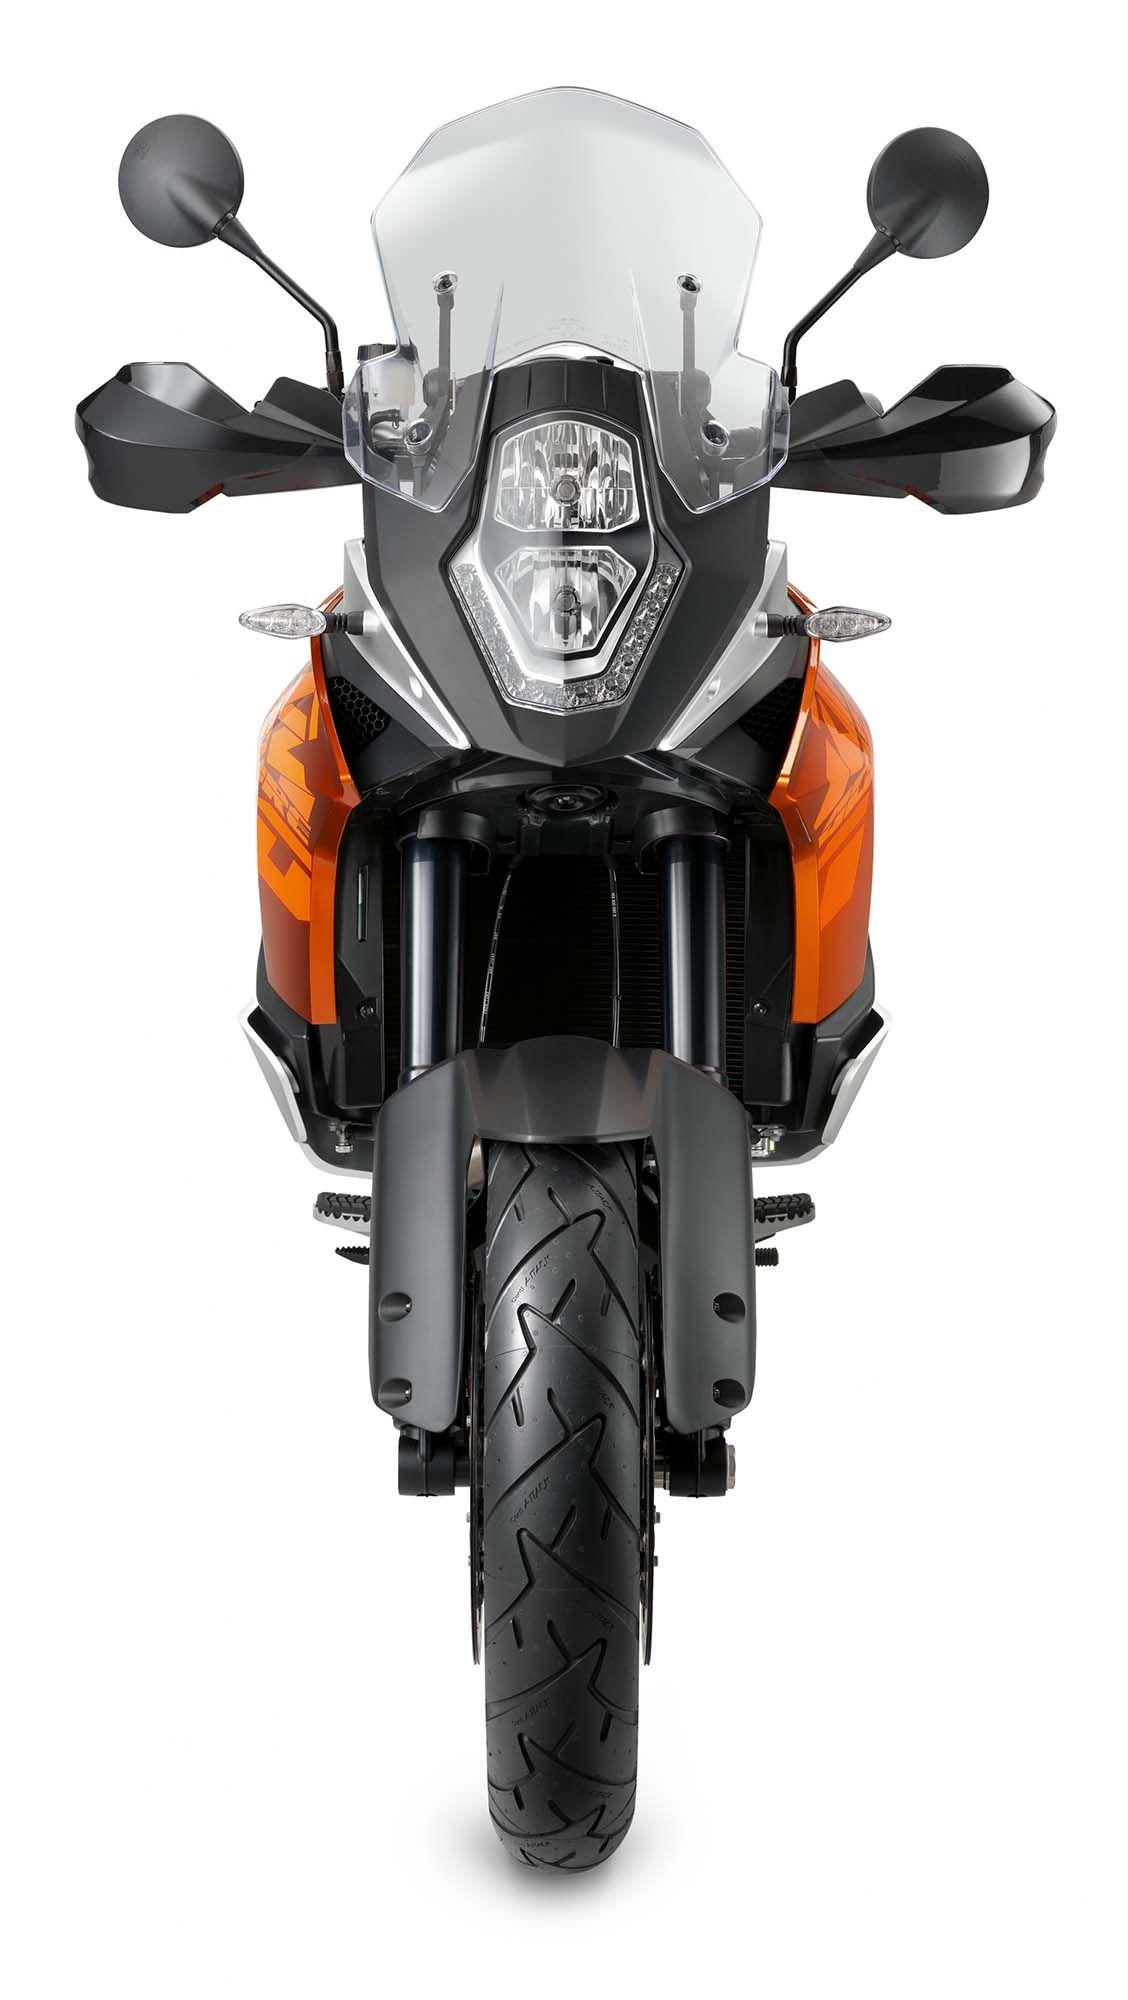 Ktm 1190 Adventure R Ktm Ktm Motorcycles Adventure